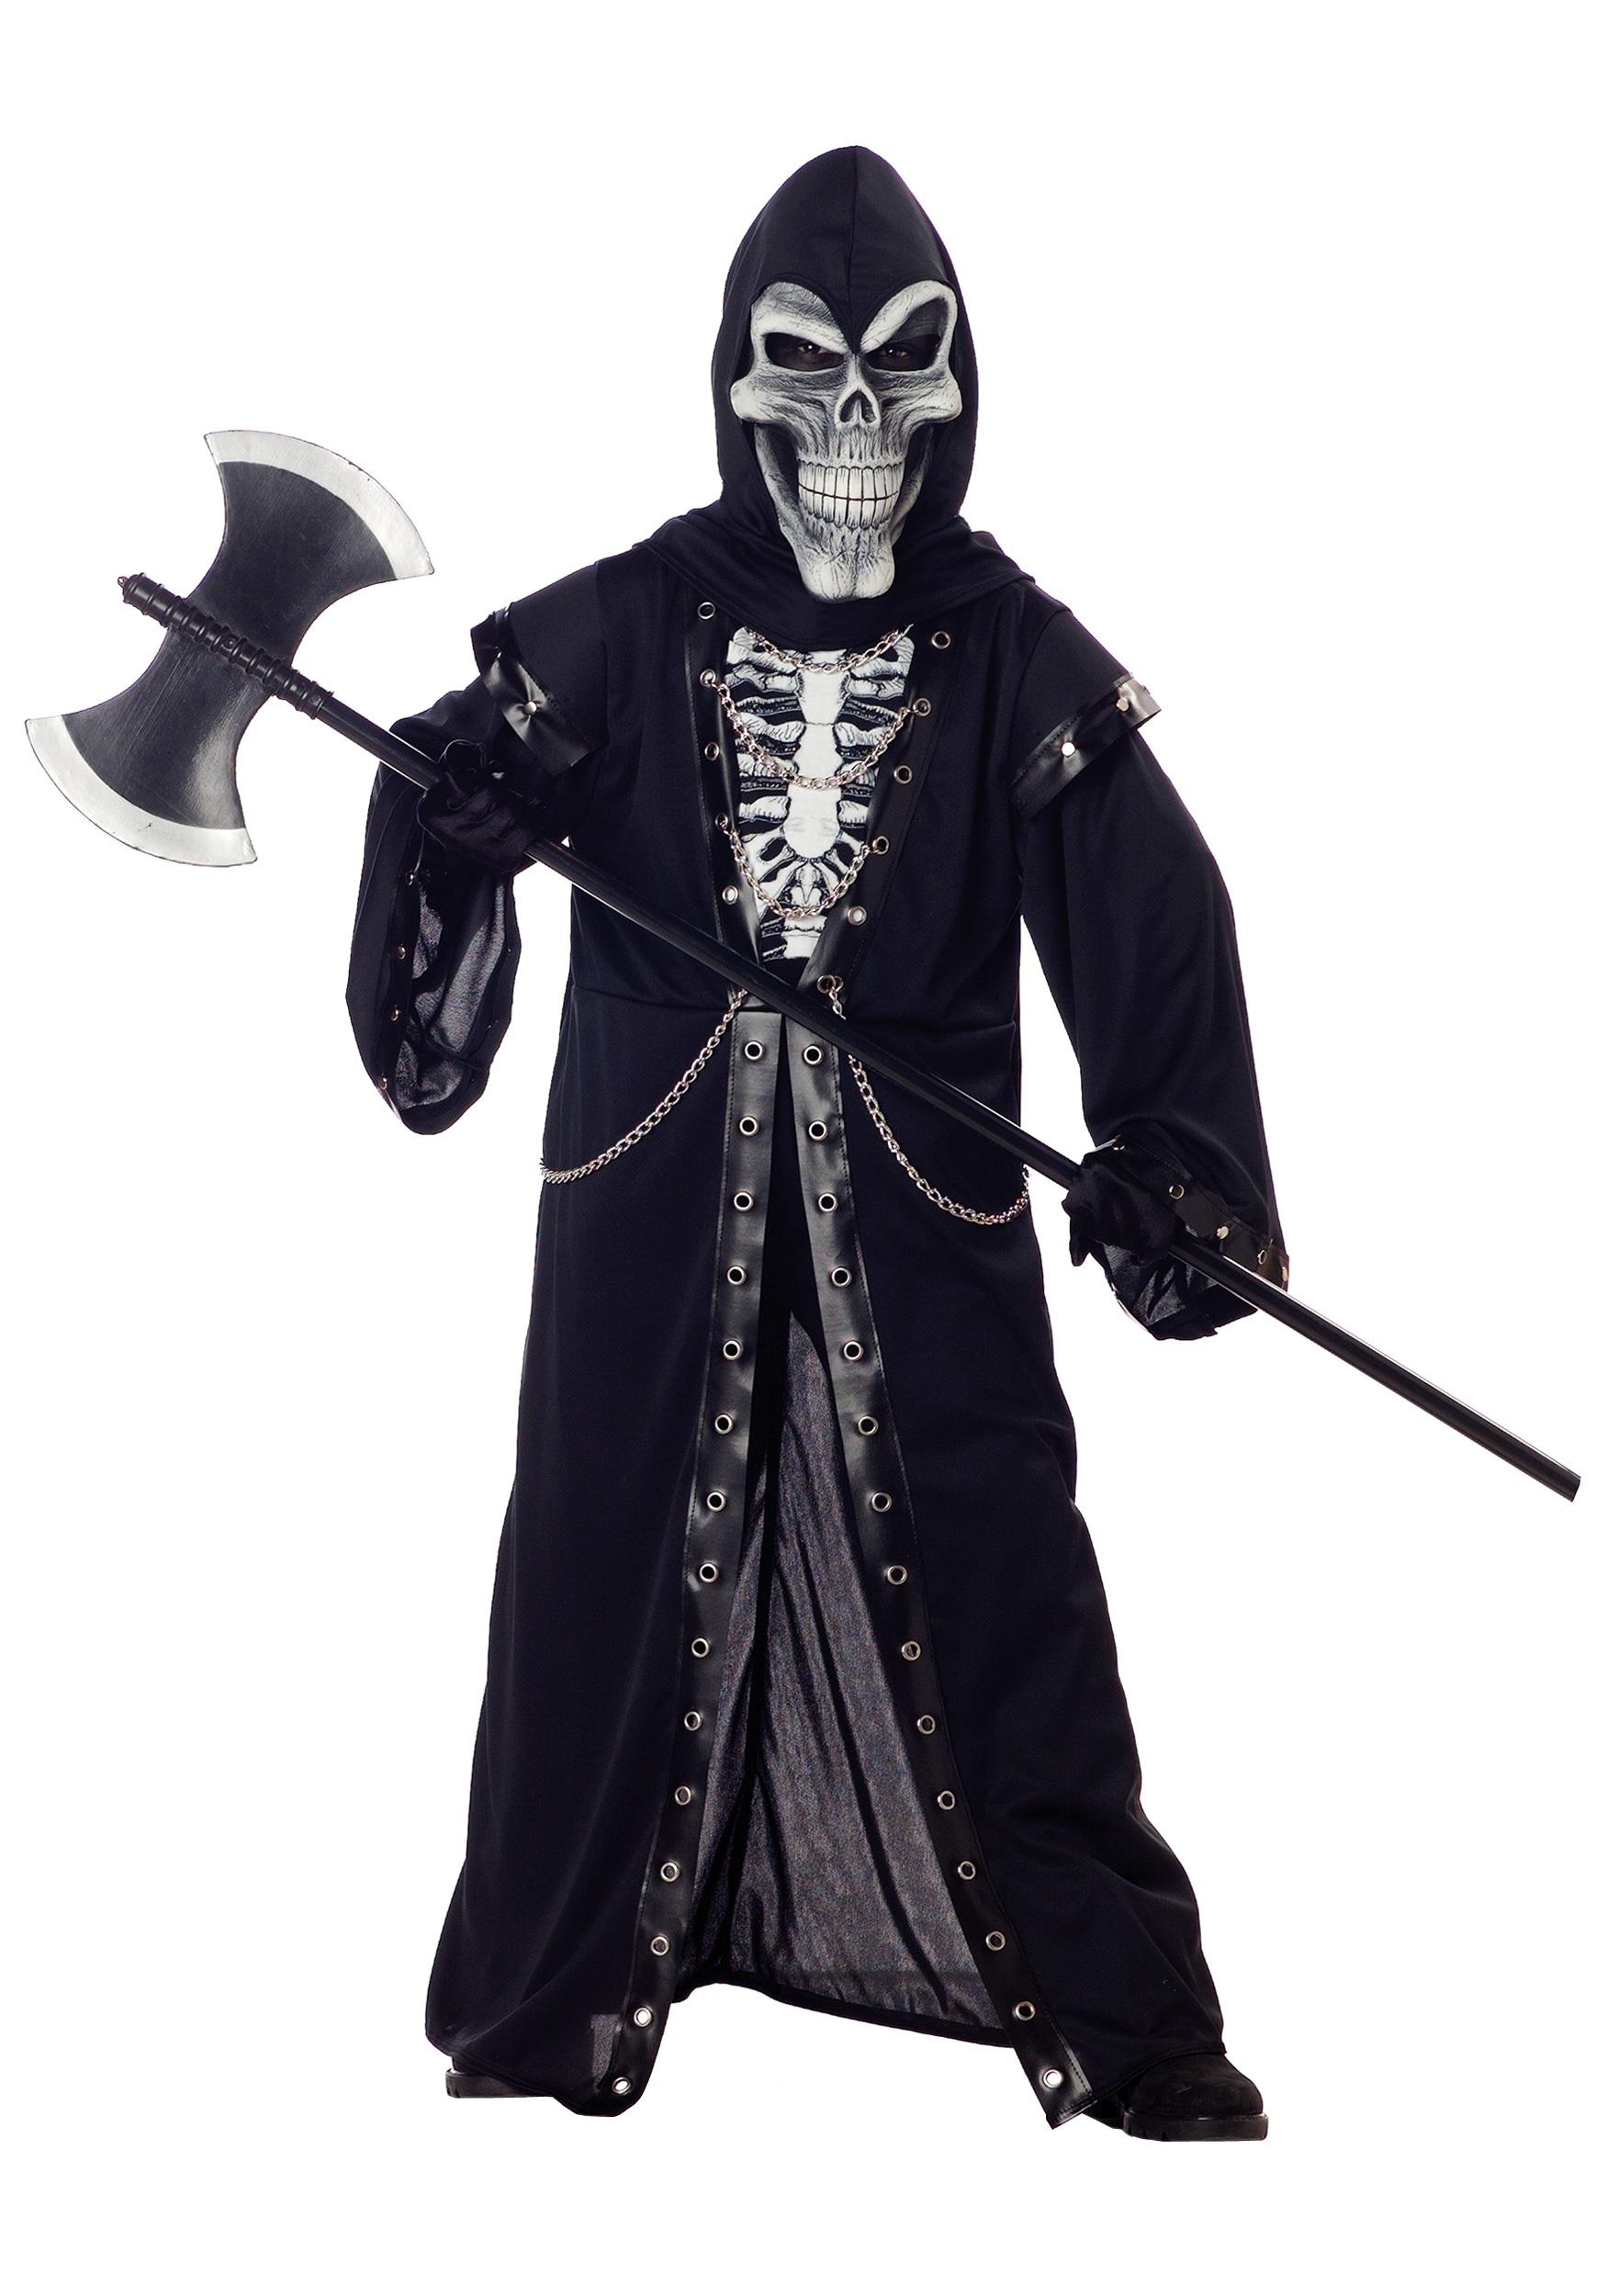 Kids Crypt Master Skeleton Costume  sc 1 st  Halloween Costumes & Kids Crypt Master Skeleton Costume - Halloween Costumes